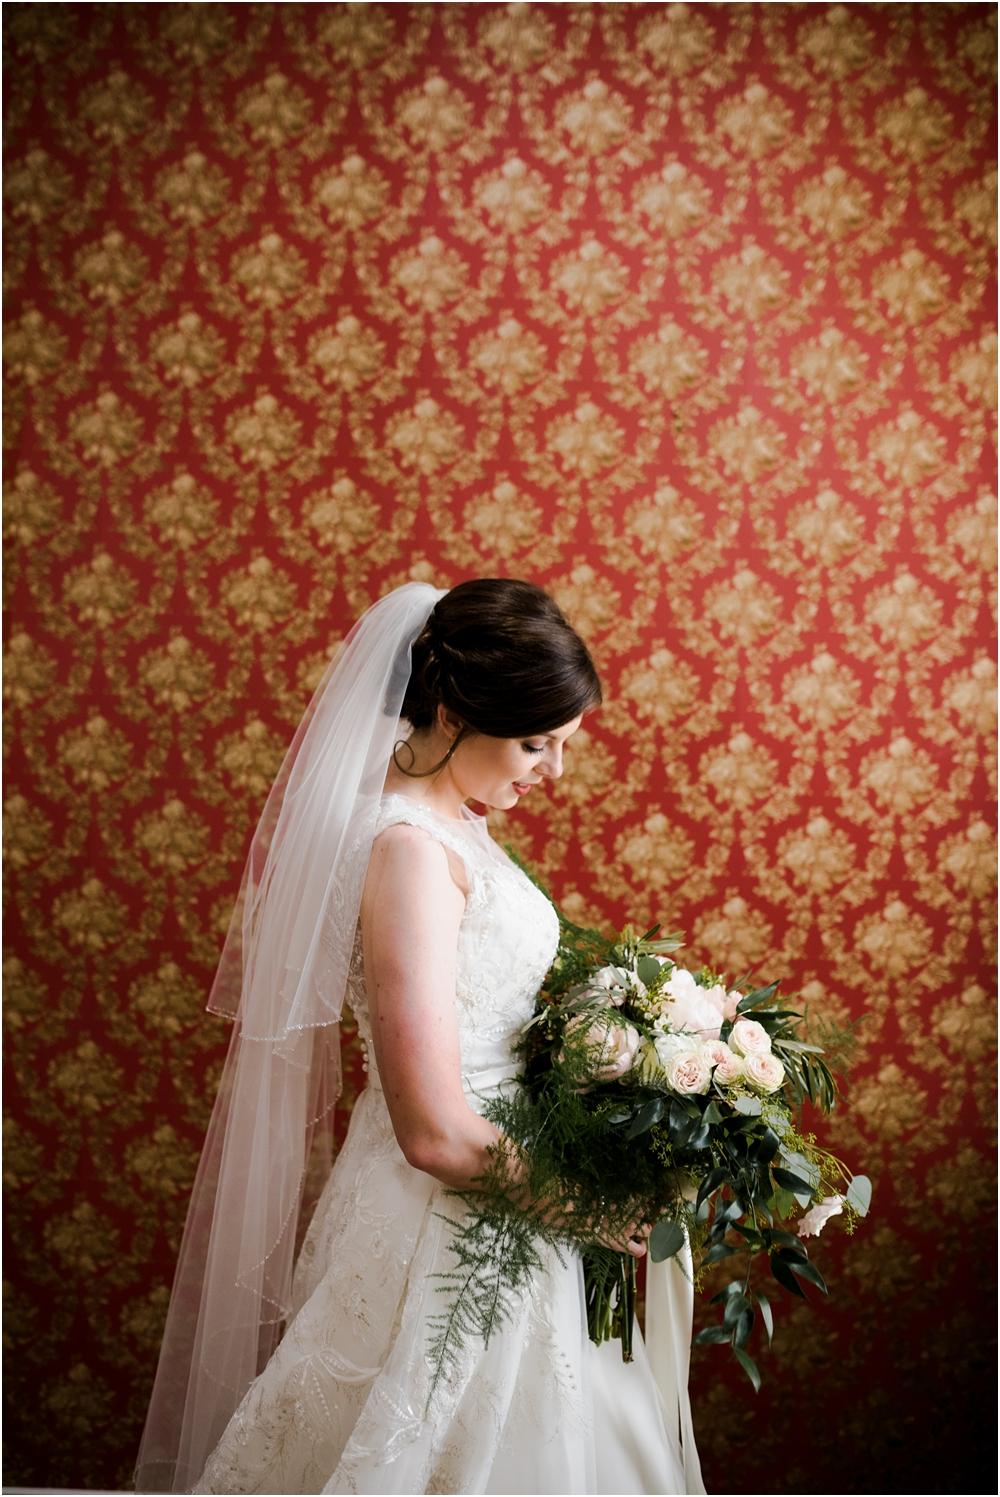 marianna-florida-wedding-photographer-kiersten-grant-32.jpg